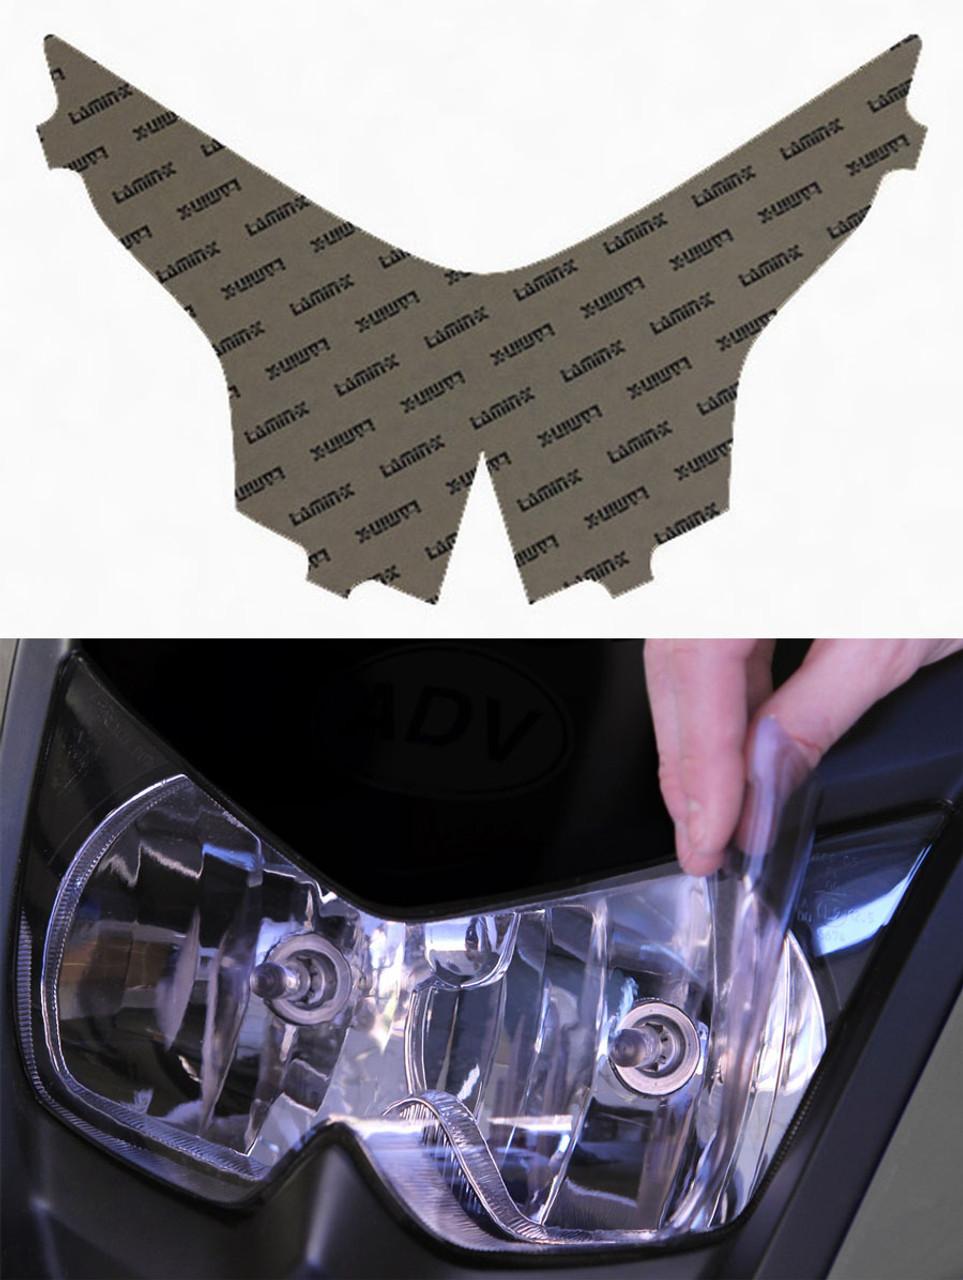 Lamin-x HU001CL Headlight Cover